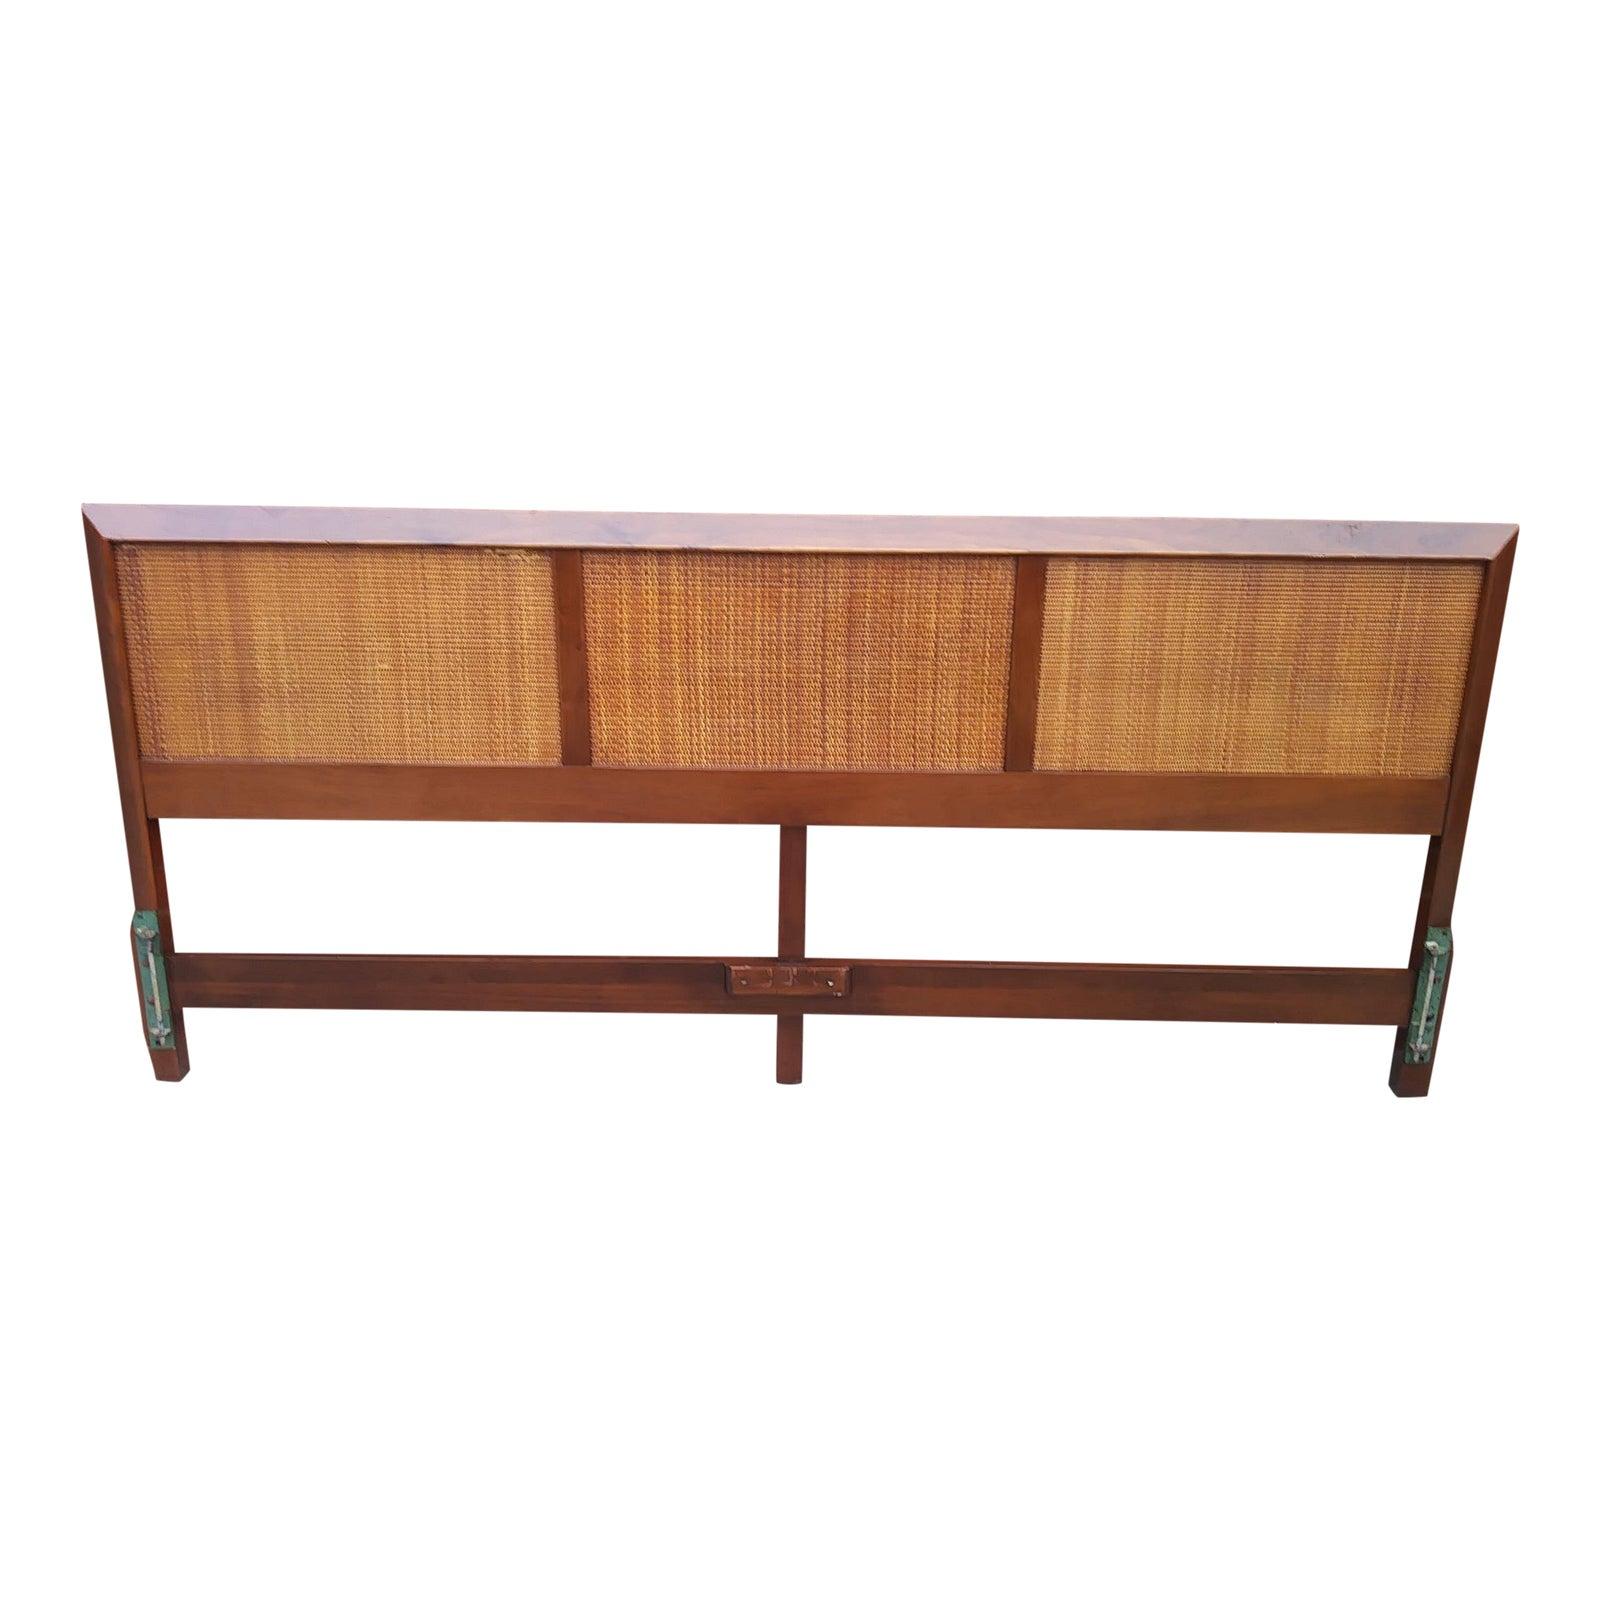 1960s vintage j b van sciver mid century modern king size cane wood headboard chairish